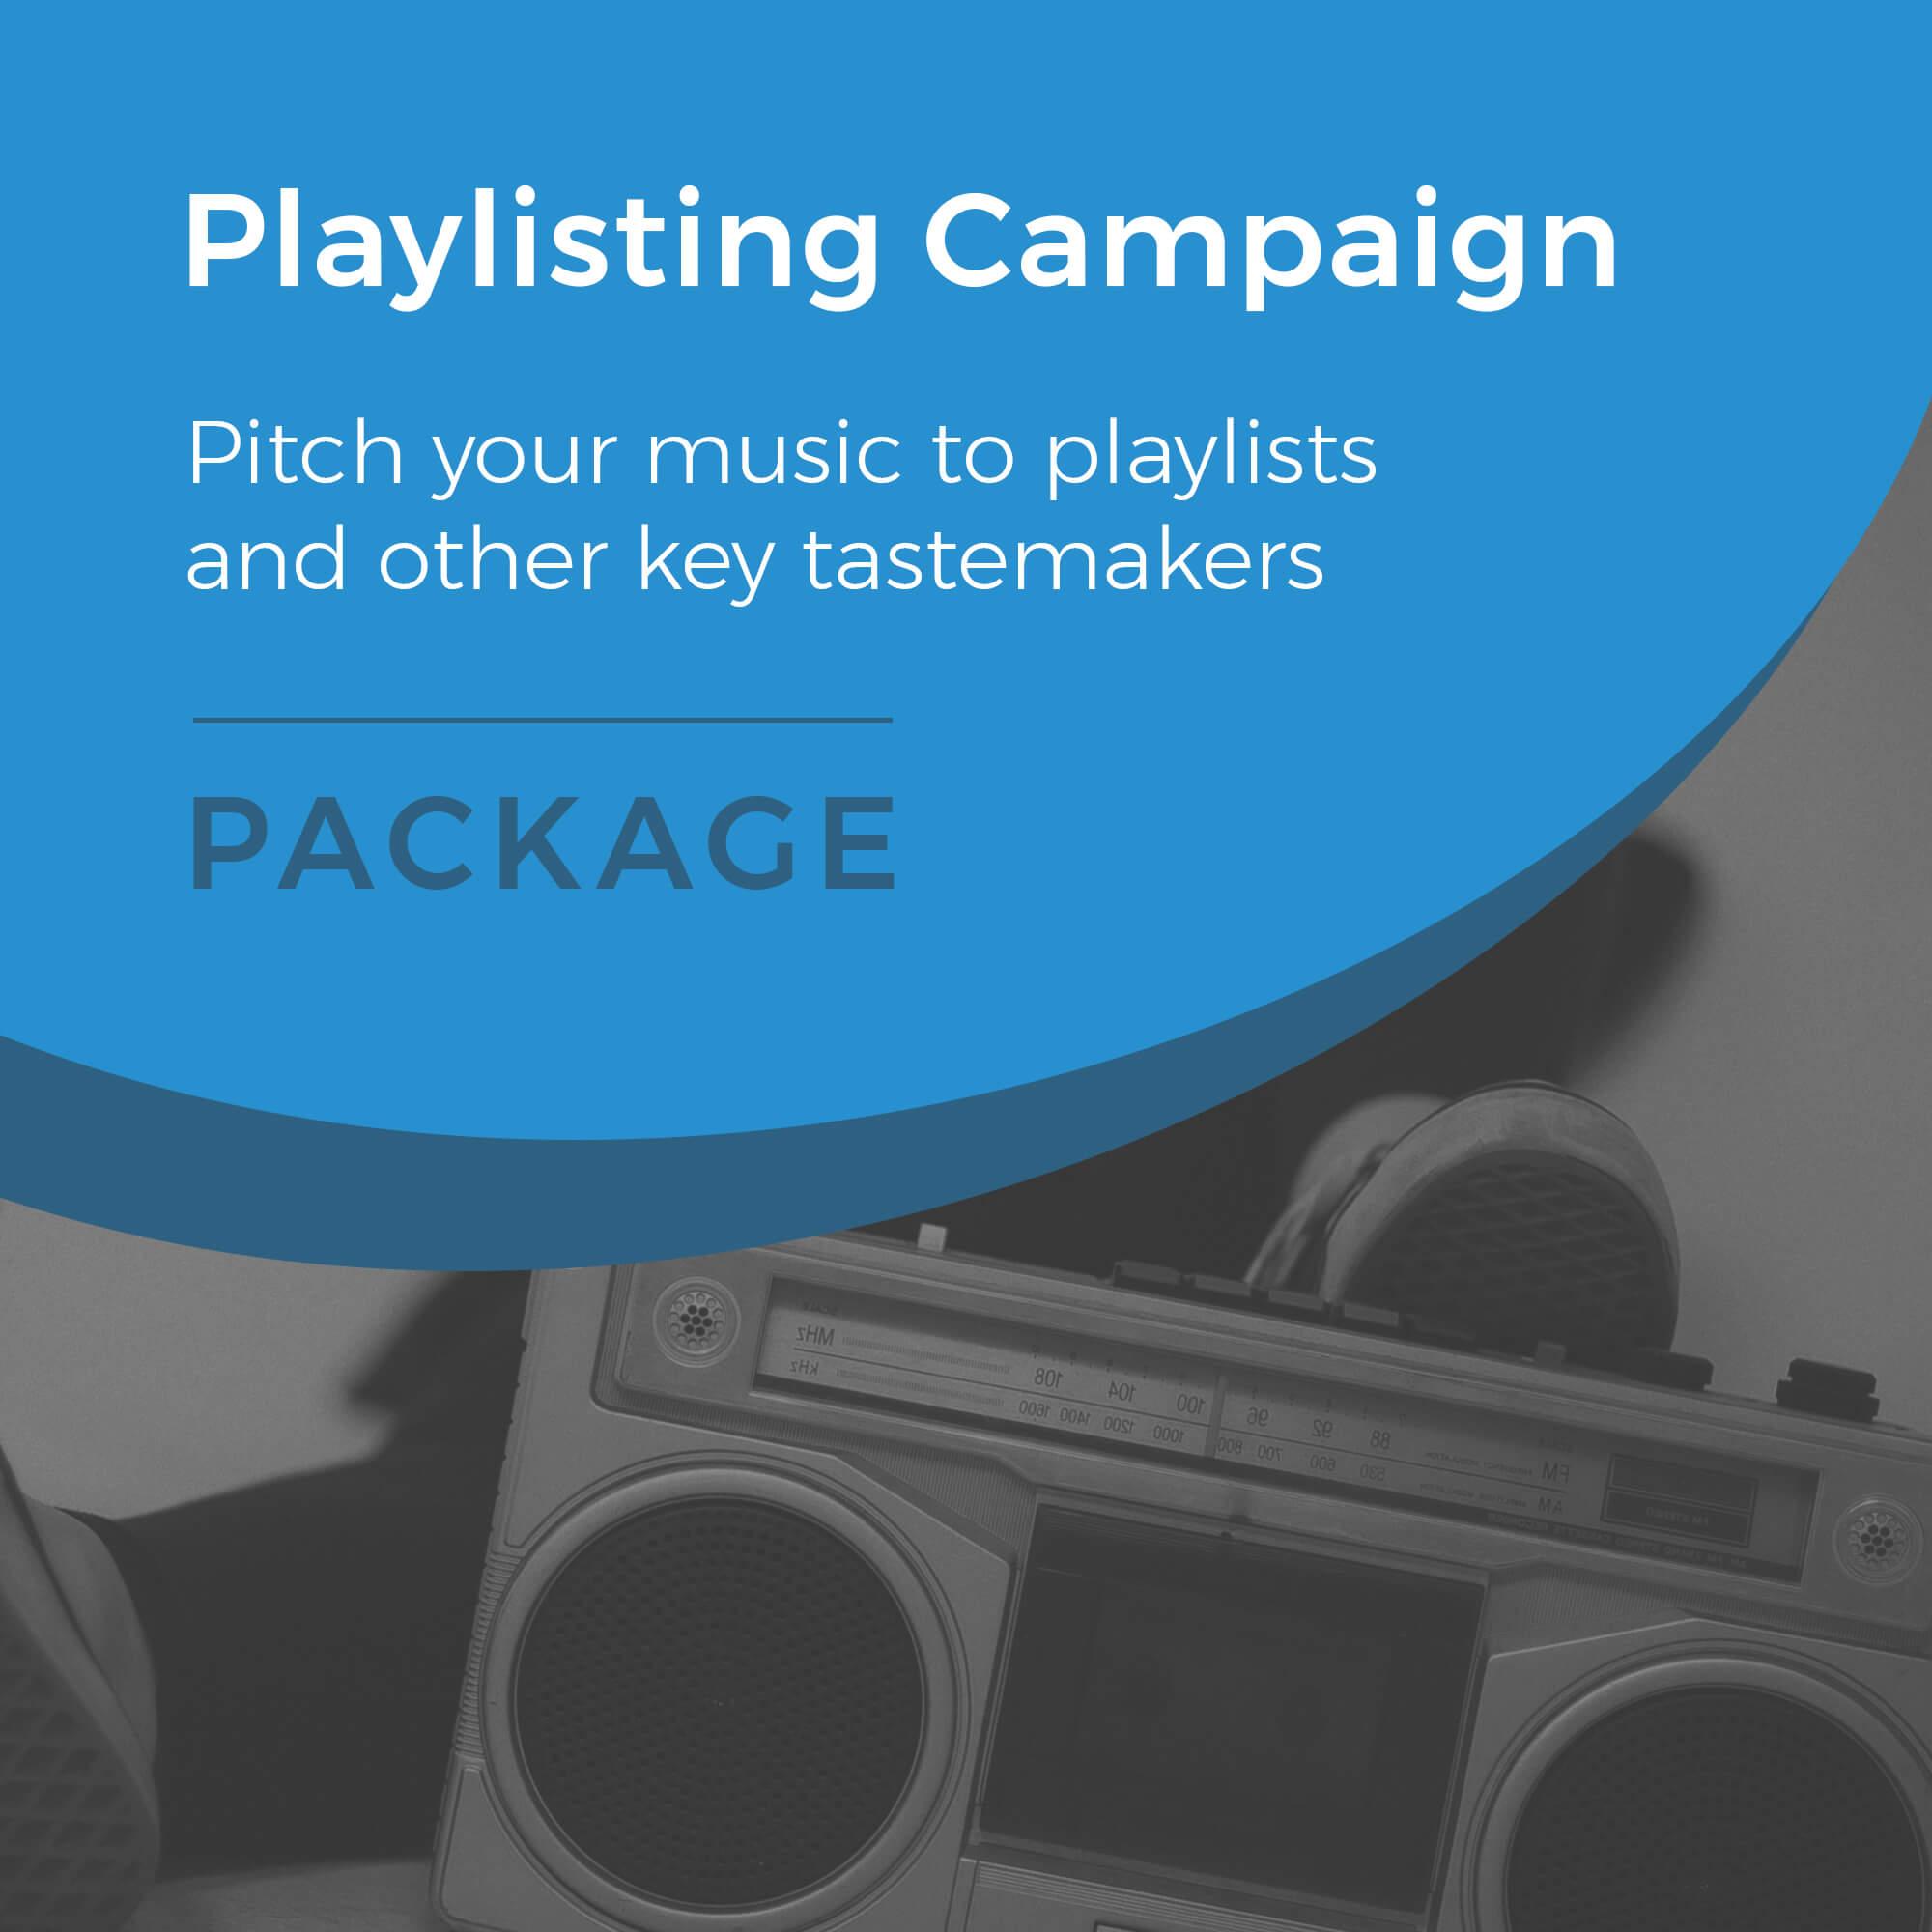 playlisting